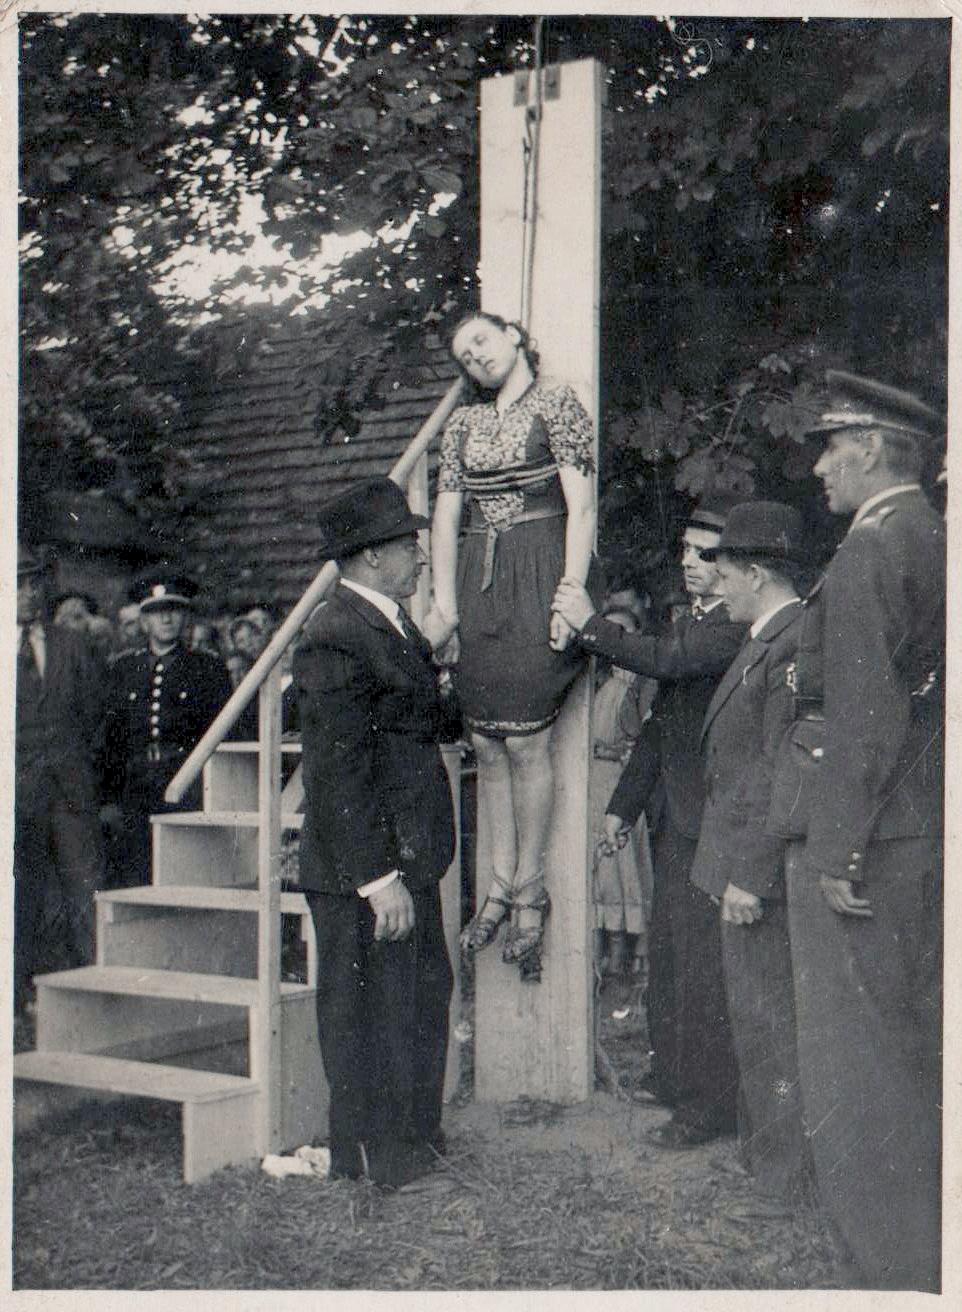 Women hanged by nazis